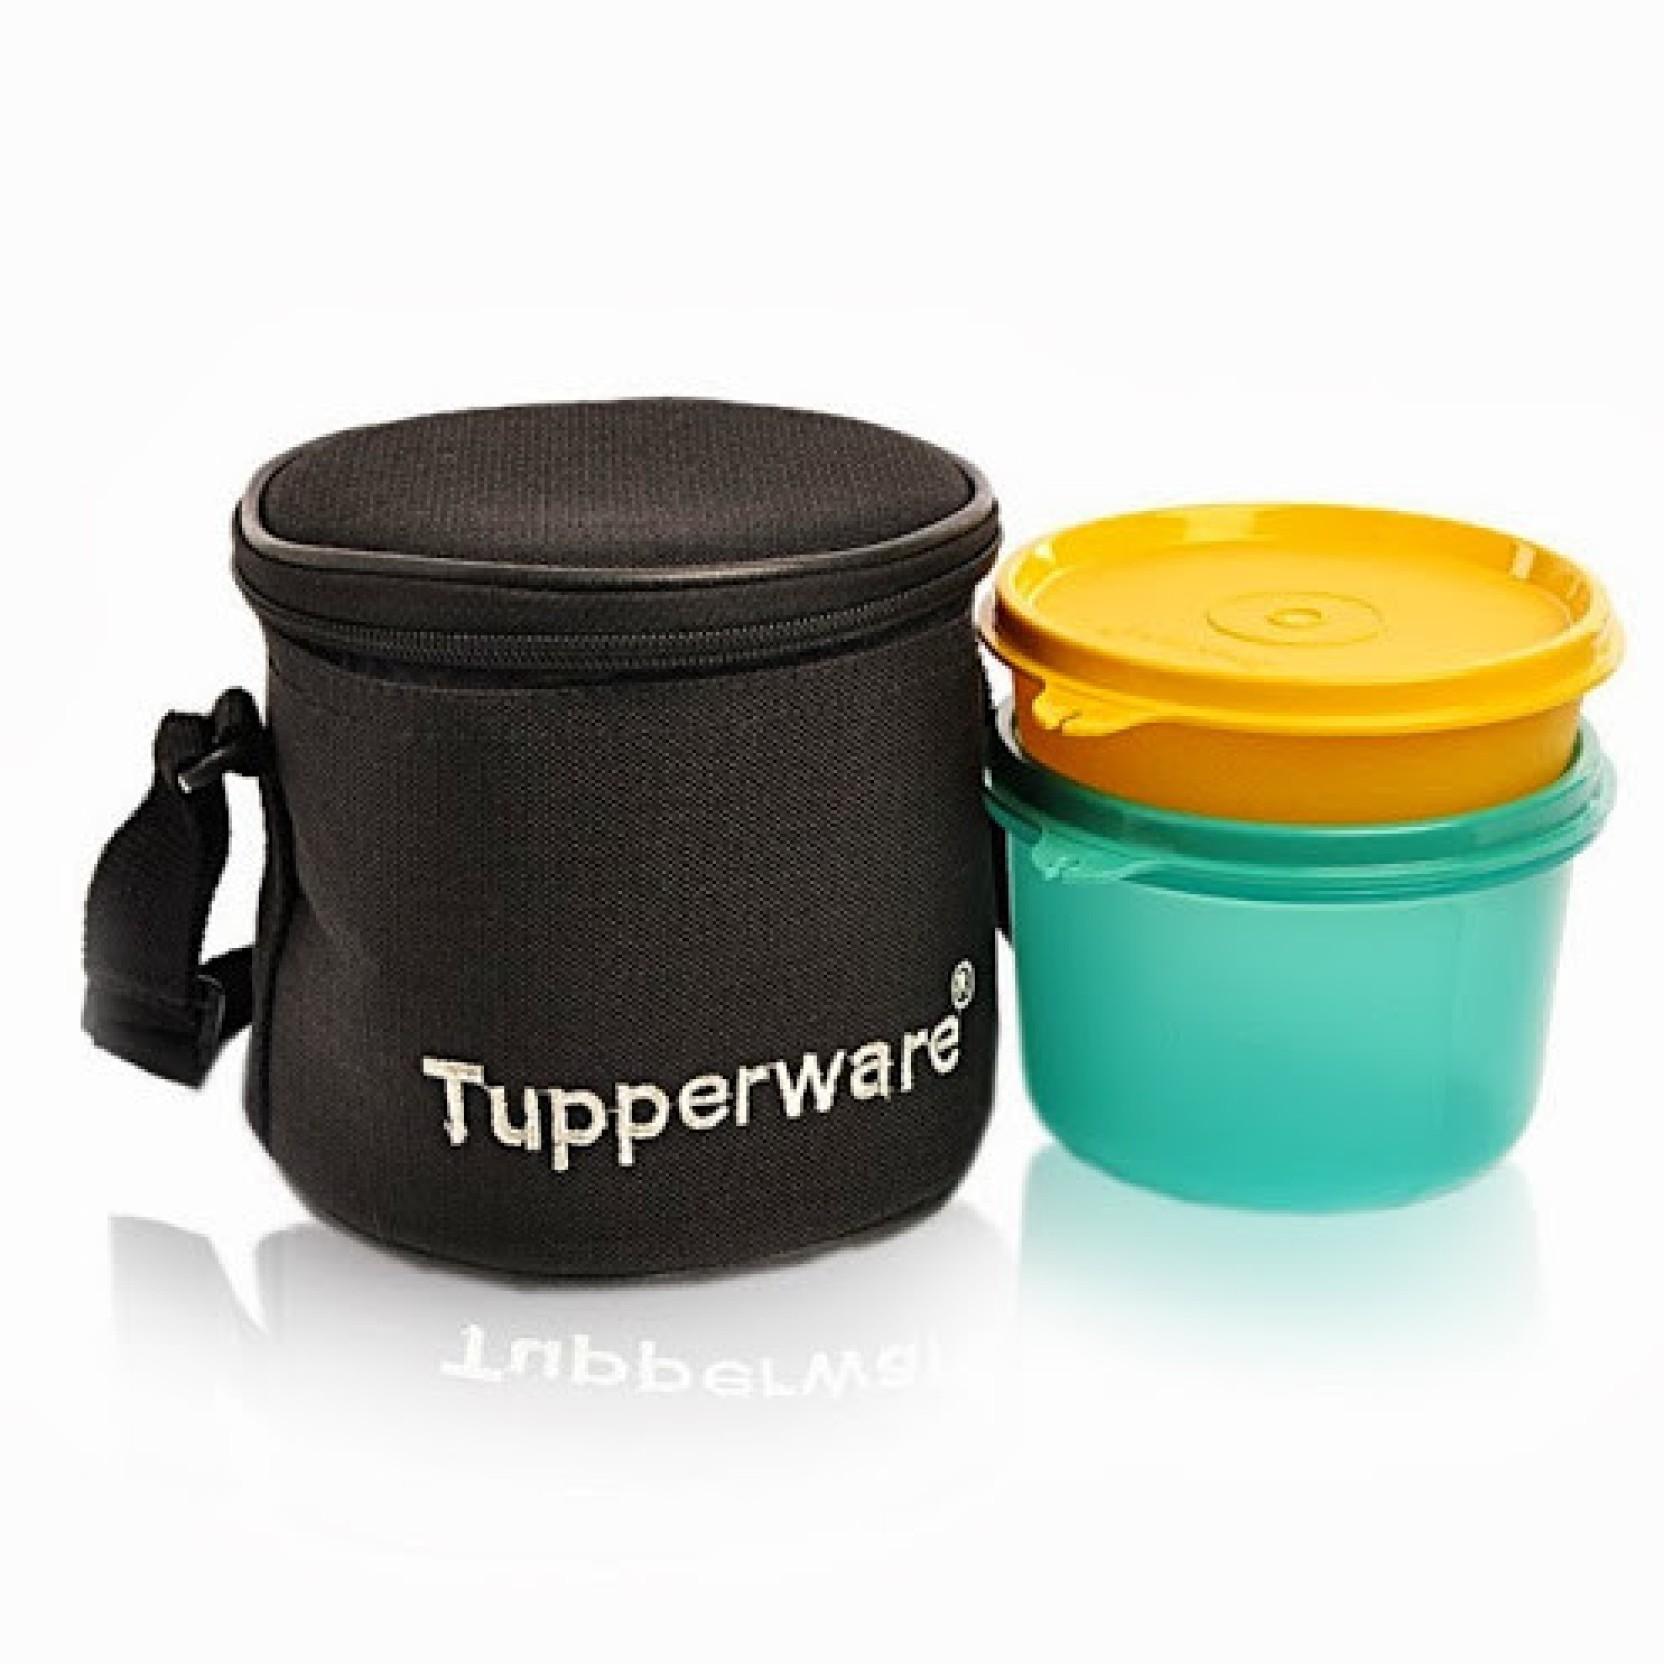 tupperware junior executive 2 containers. Black Bedroom Furniture Sets. Home Design Ideas